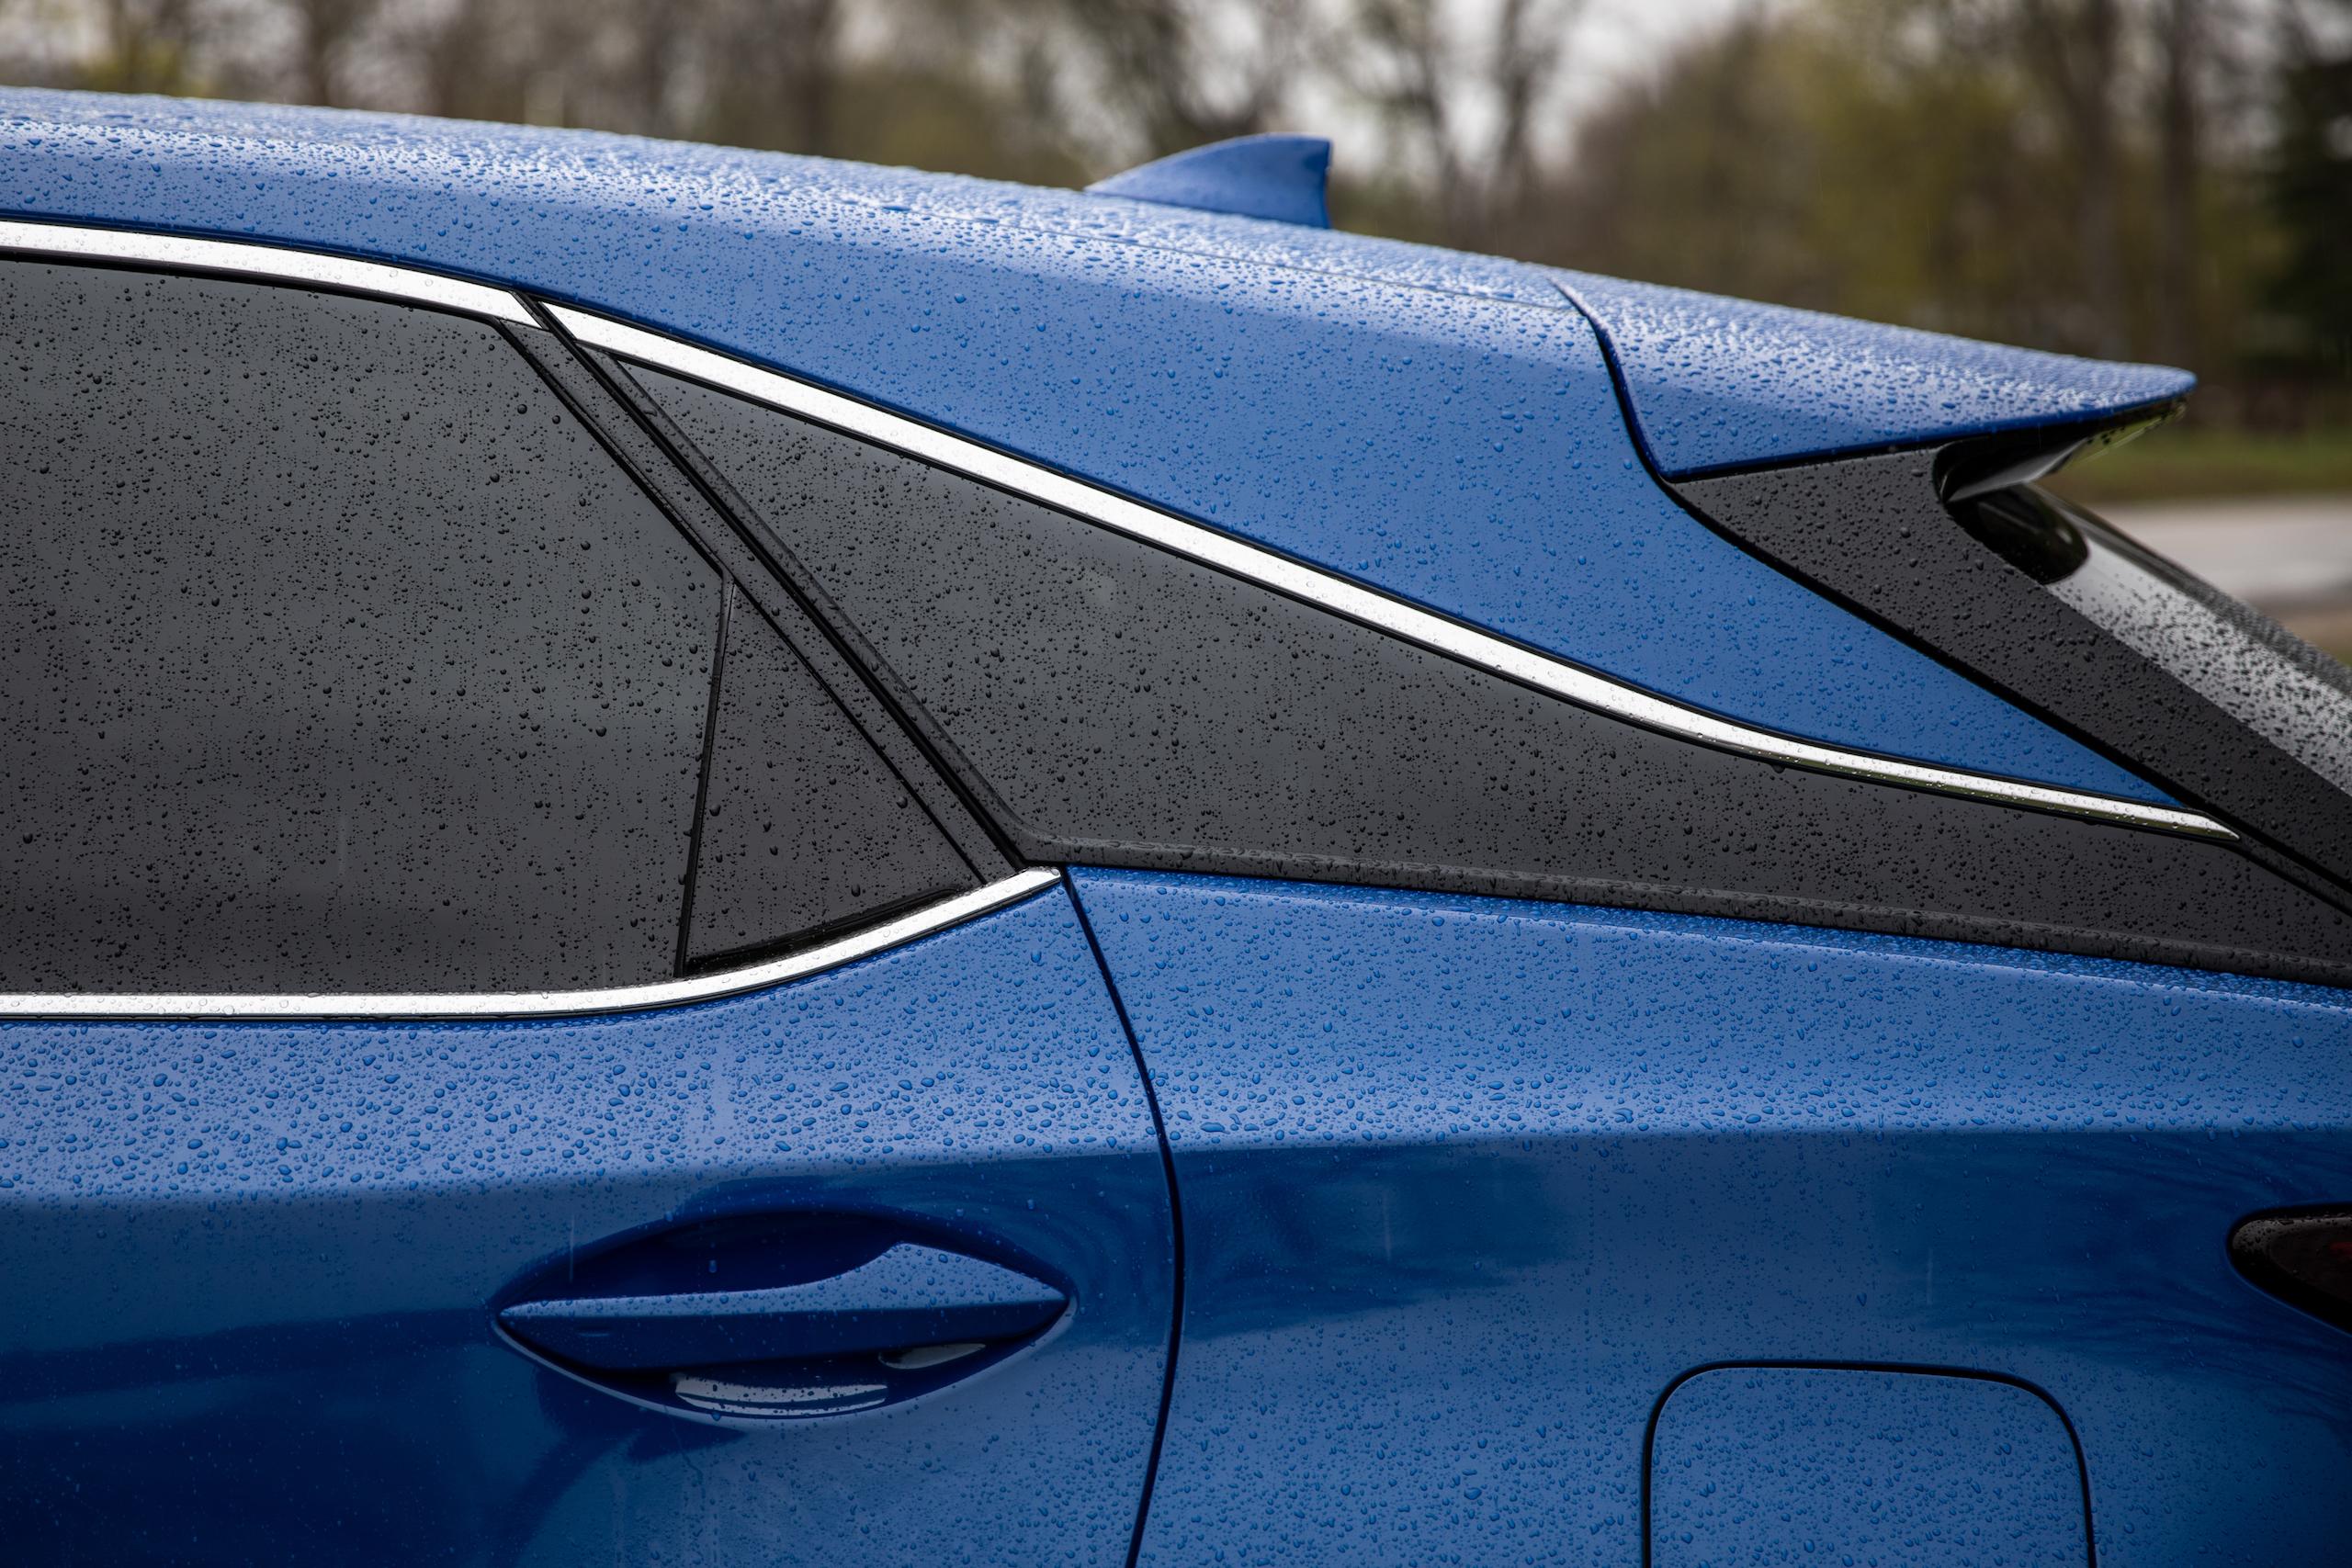 2021 Lexus RX450h rear quarter panel roofline styling